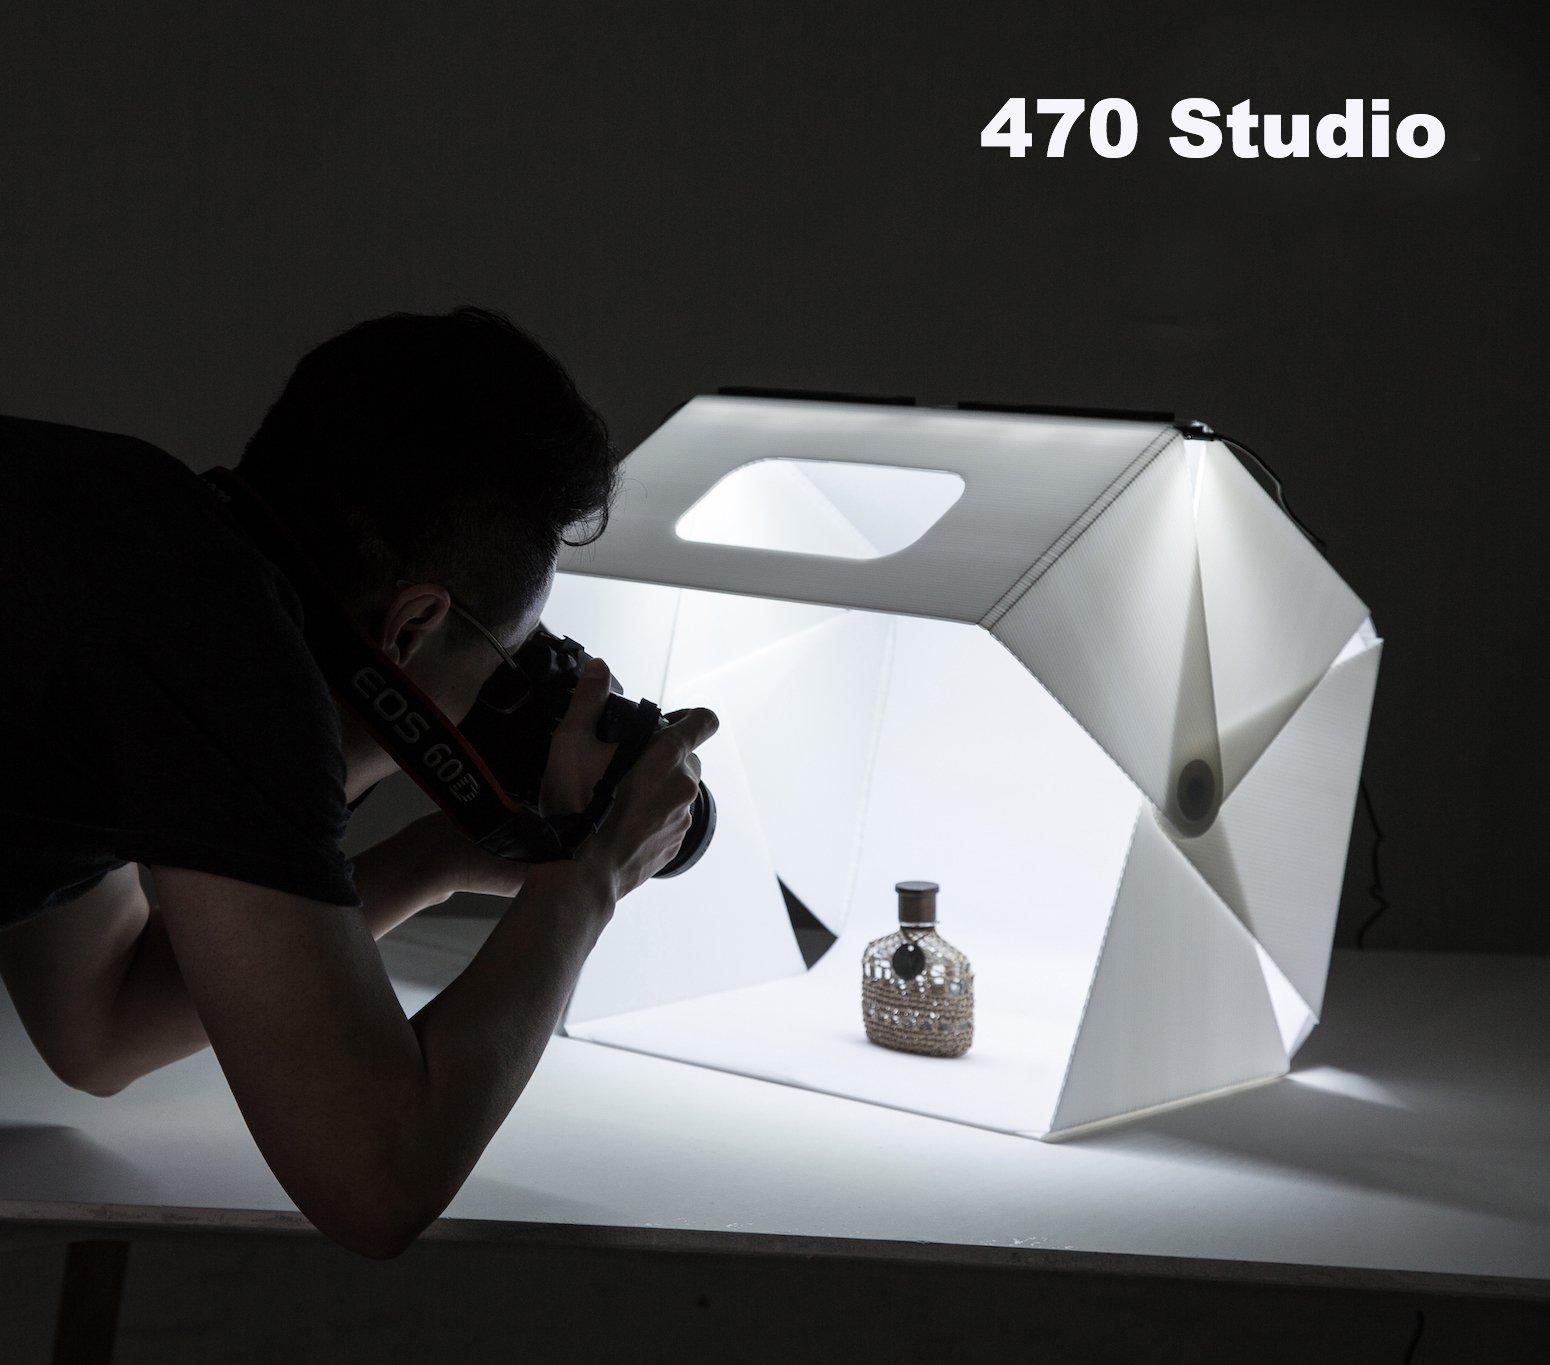 Slowbeat Foldable 15.7'' x 17'' Photo Studio LED Booth Light Box Shooting Tent Light Kit for E-Commerce Shooting - Including LED Light Set/USB Cable/White/Black Backgrounds